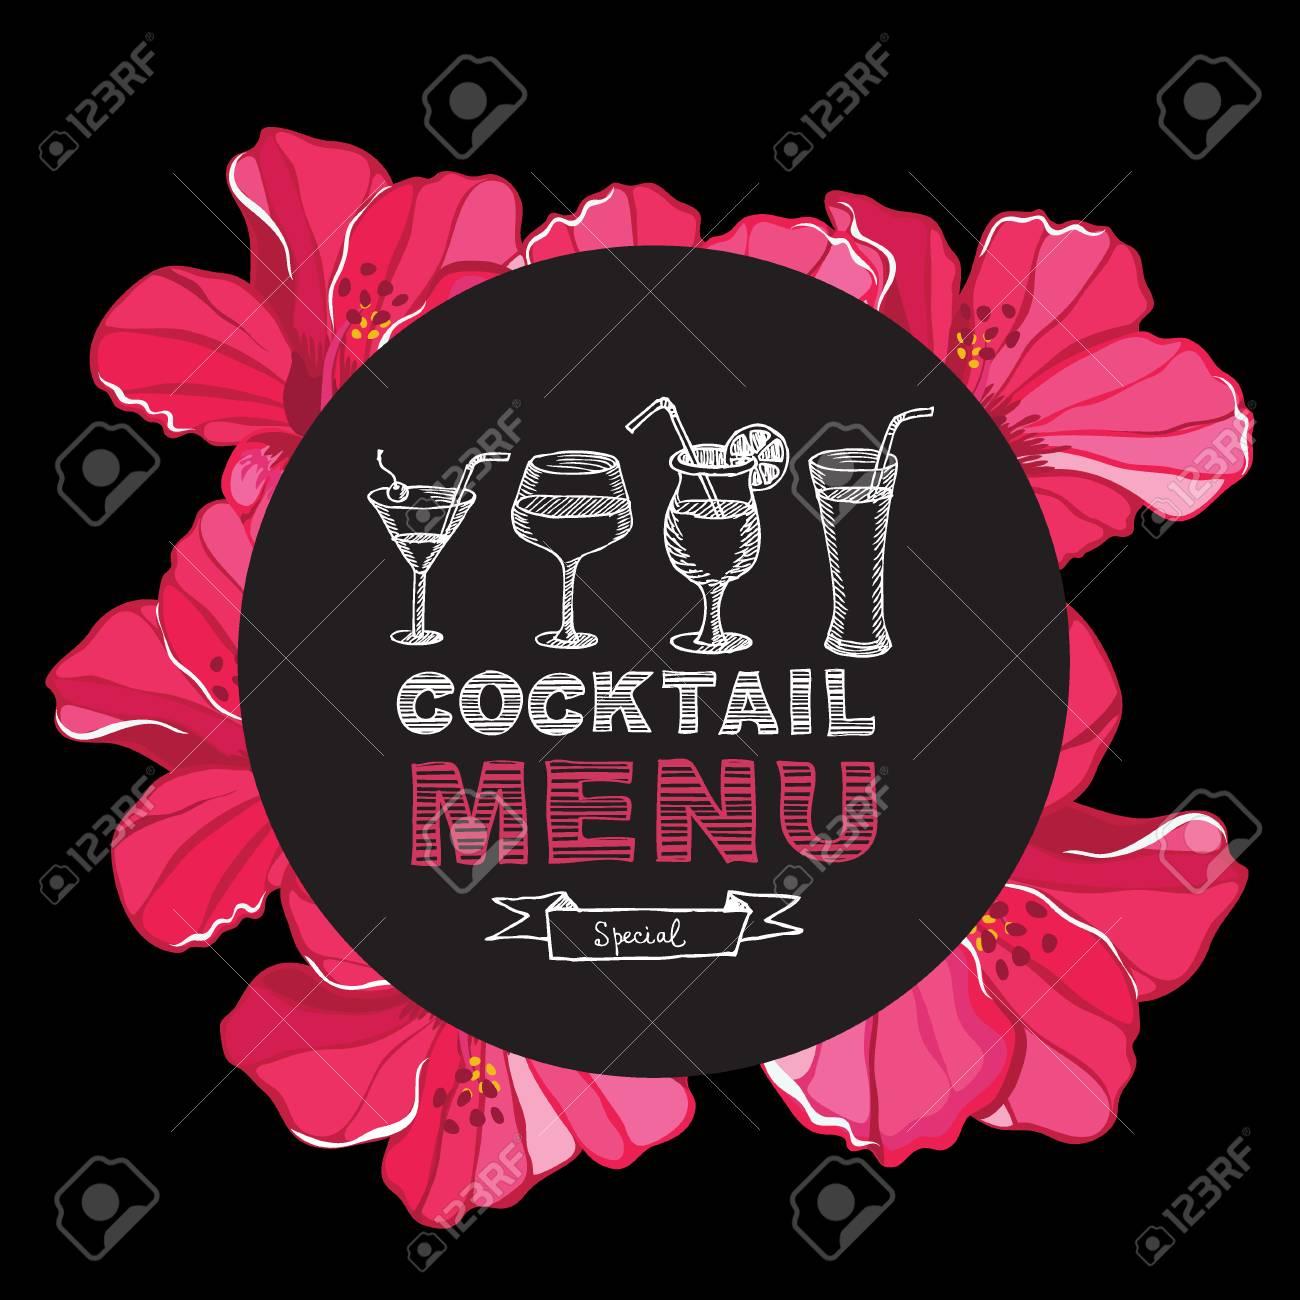 Cocktail Bar Menu, Template Design. Royalty Free Cliparts, Vectors ...